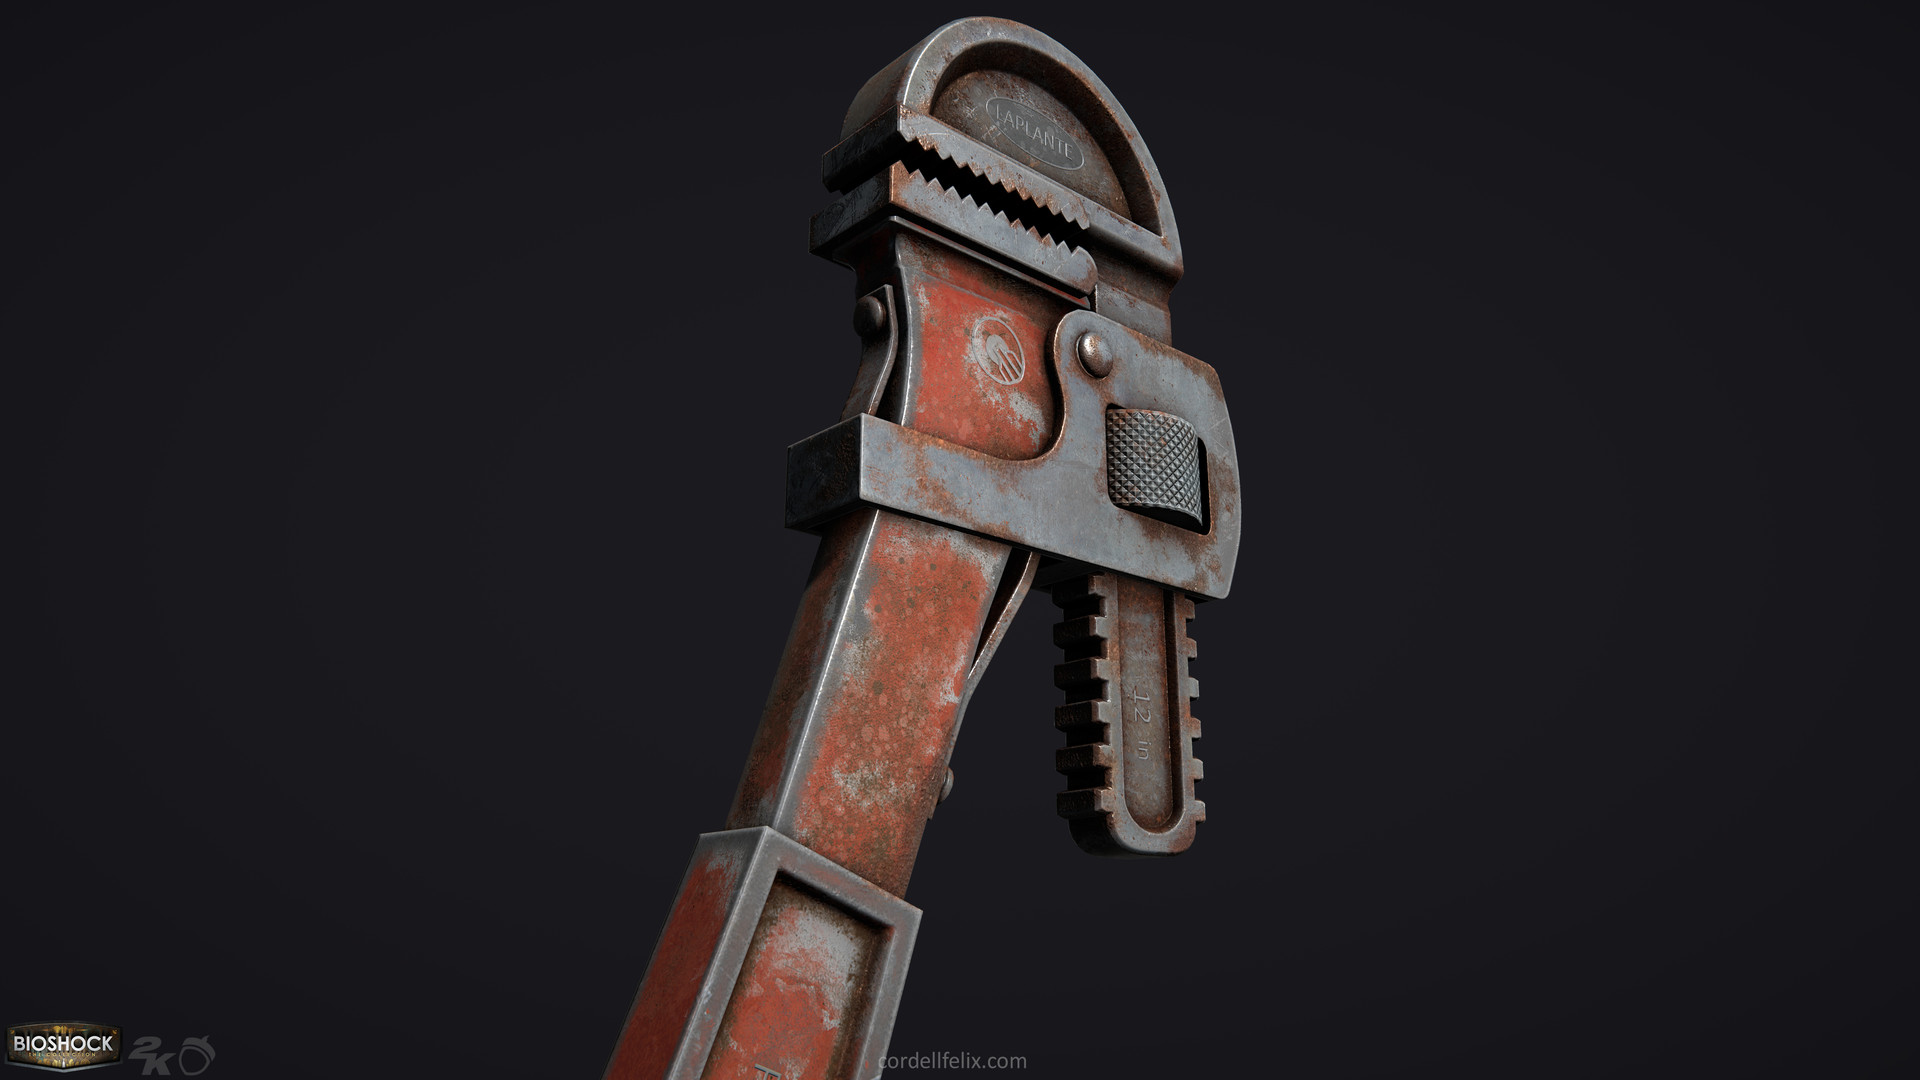 Cordell felix cordellfelix bioshock wrench 03